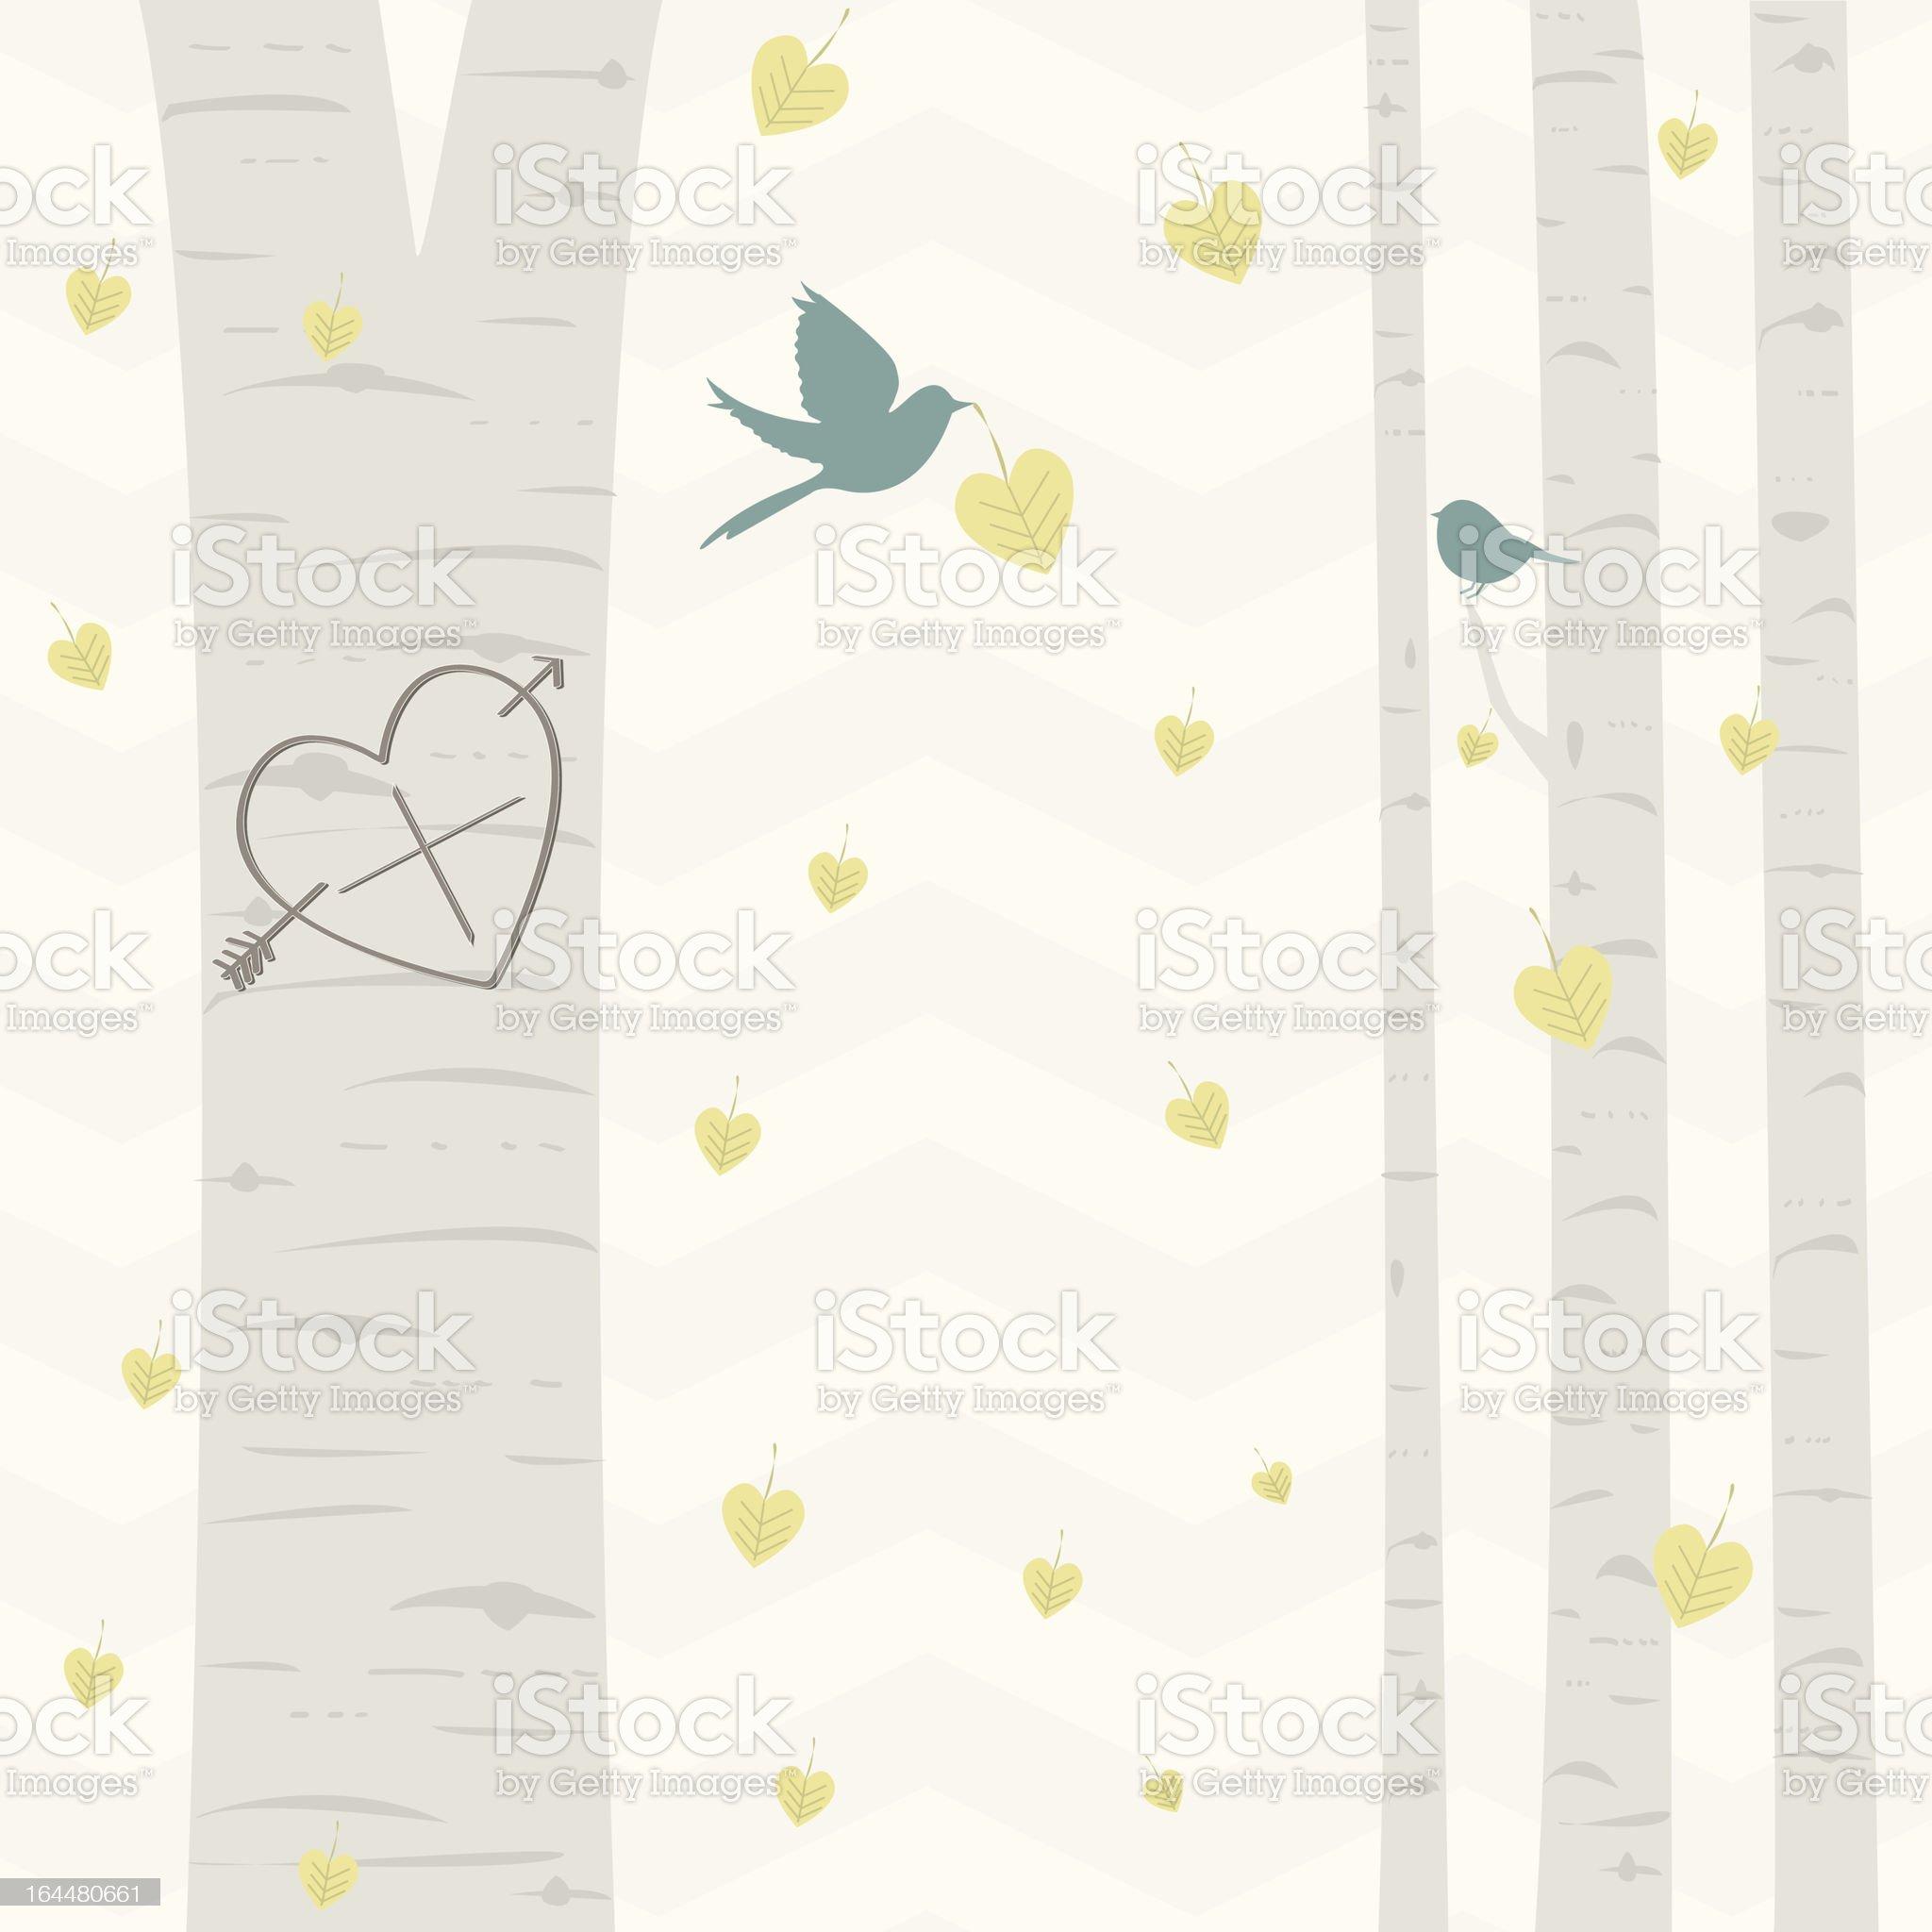 Nature Love royalty-free stock vector art